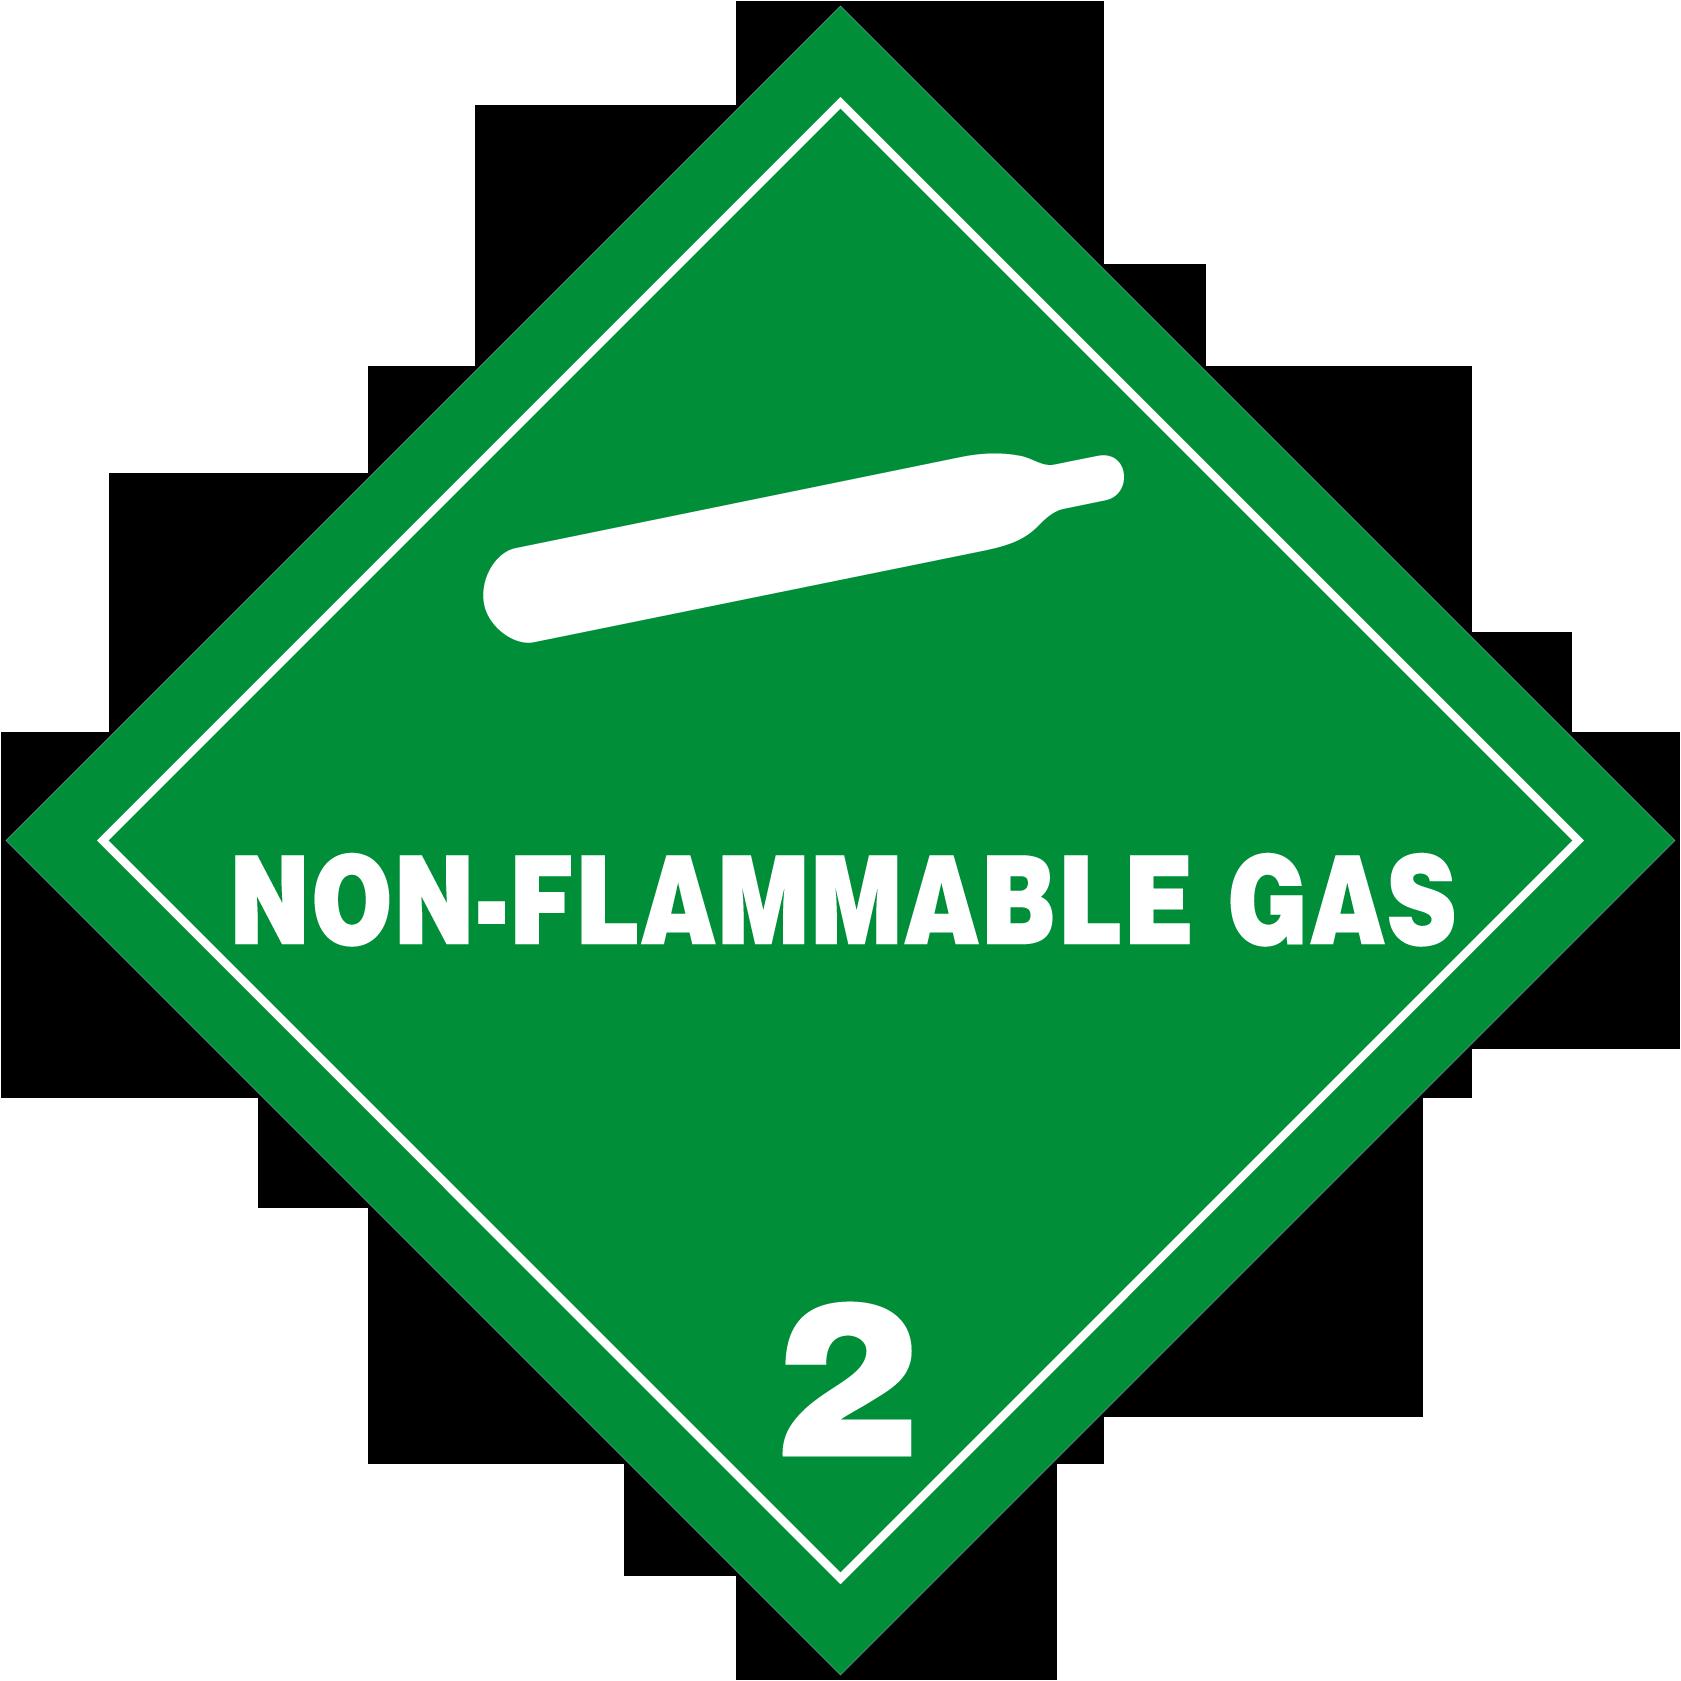 class 2 gases placards and labels according 49 cfr 173 logo hazmat bomba hazmat logo on boxes